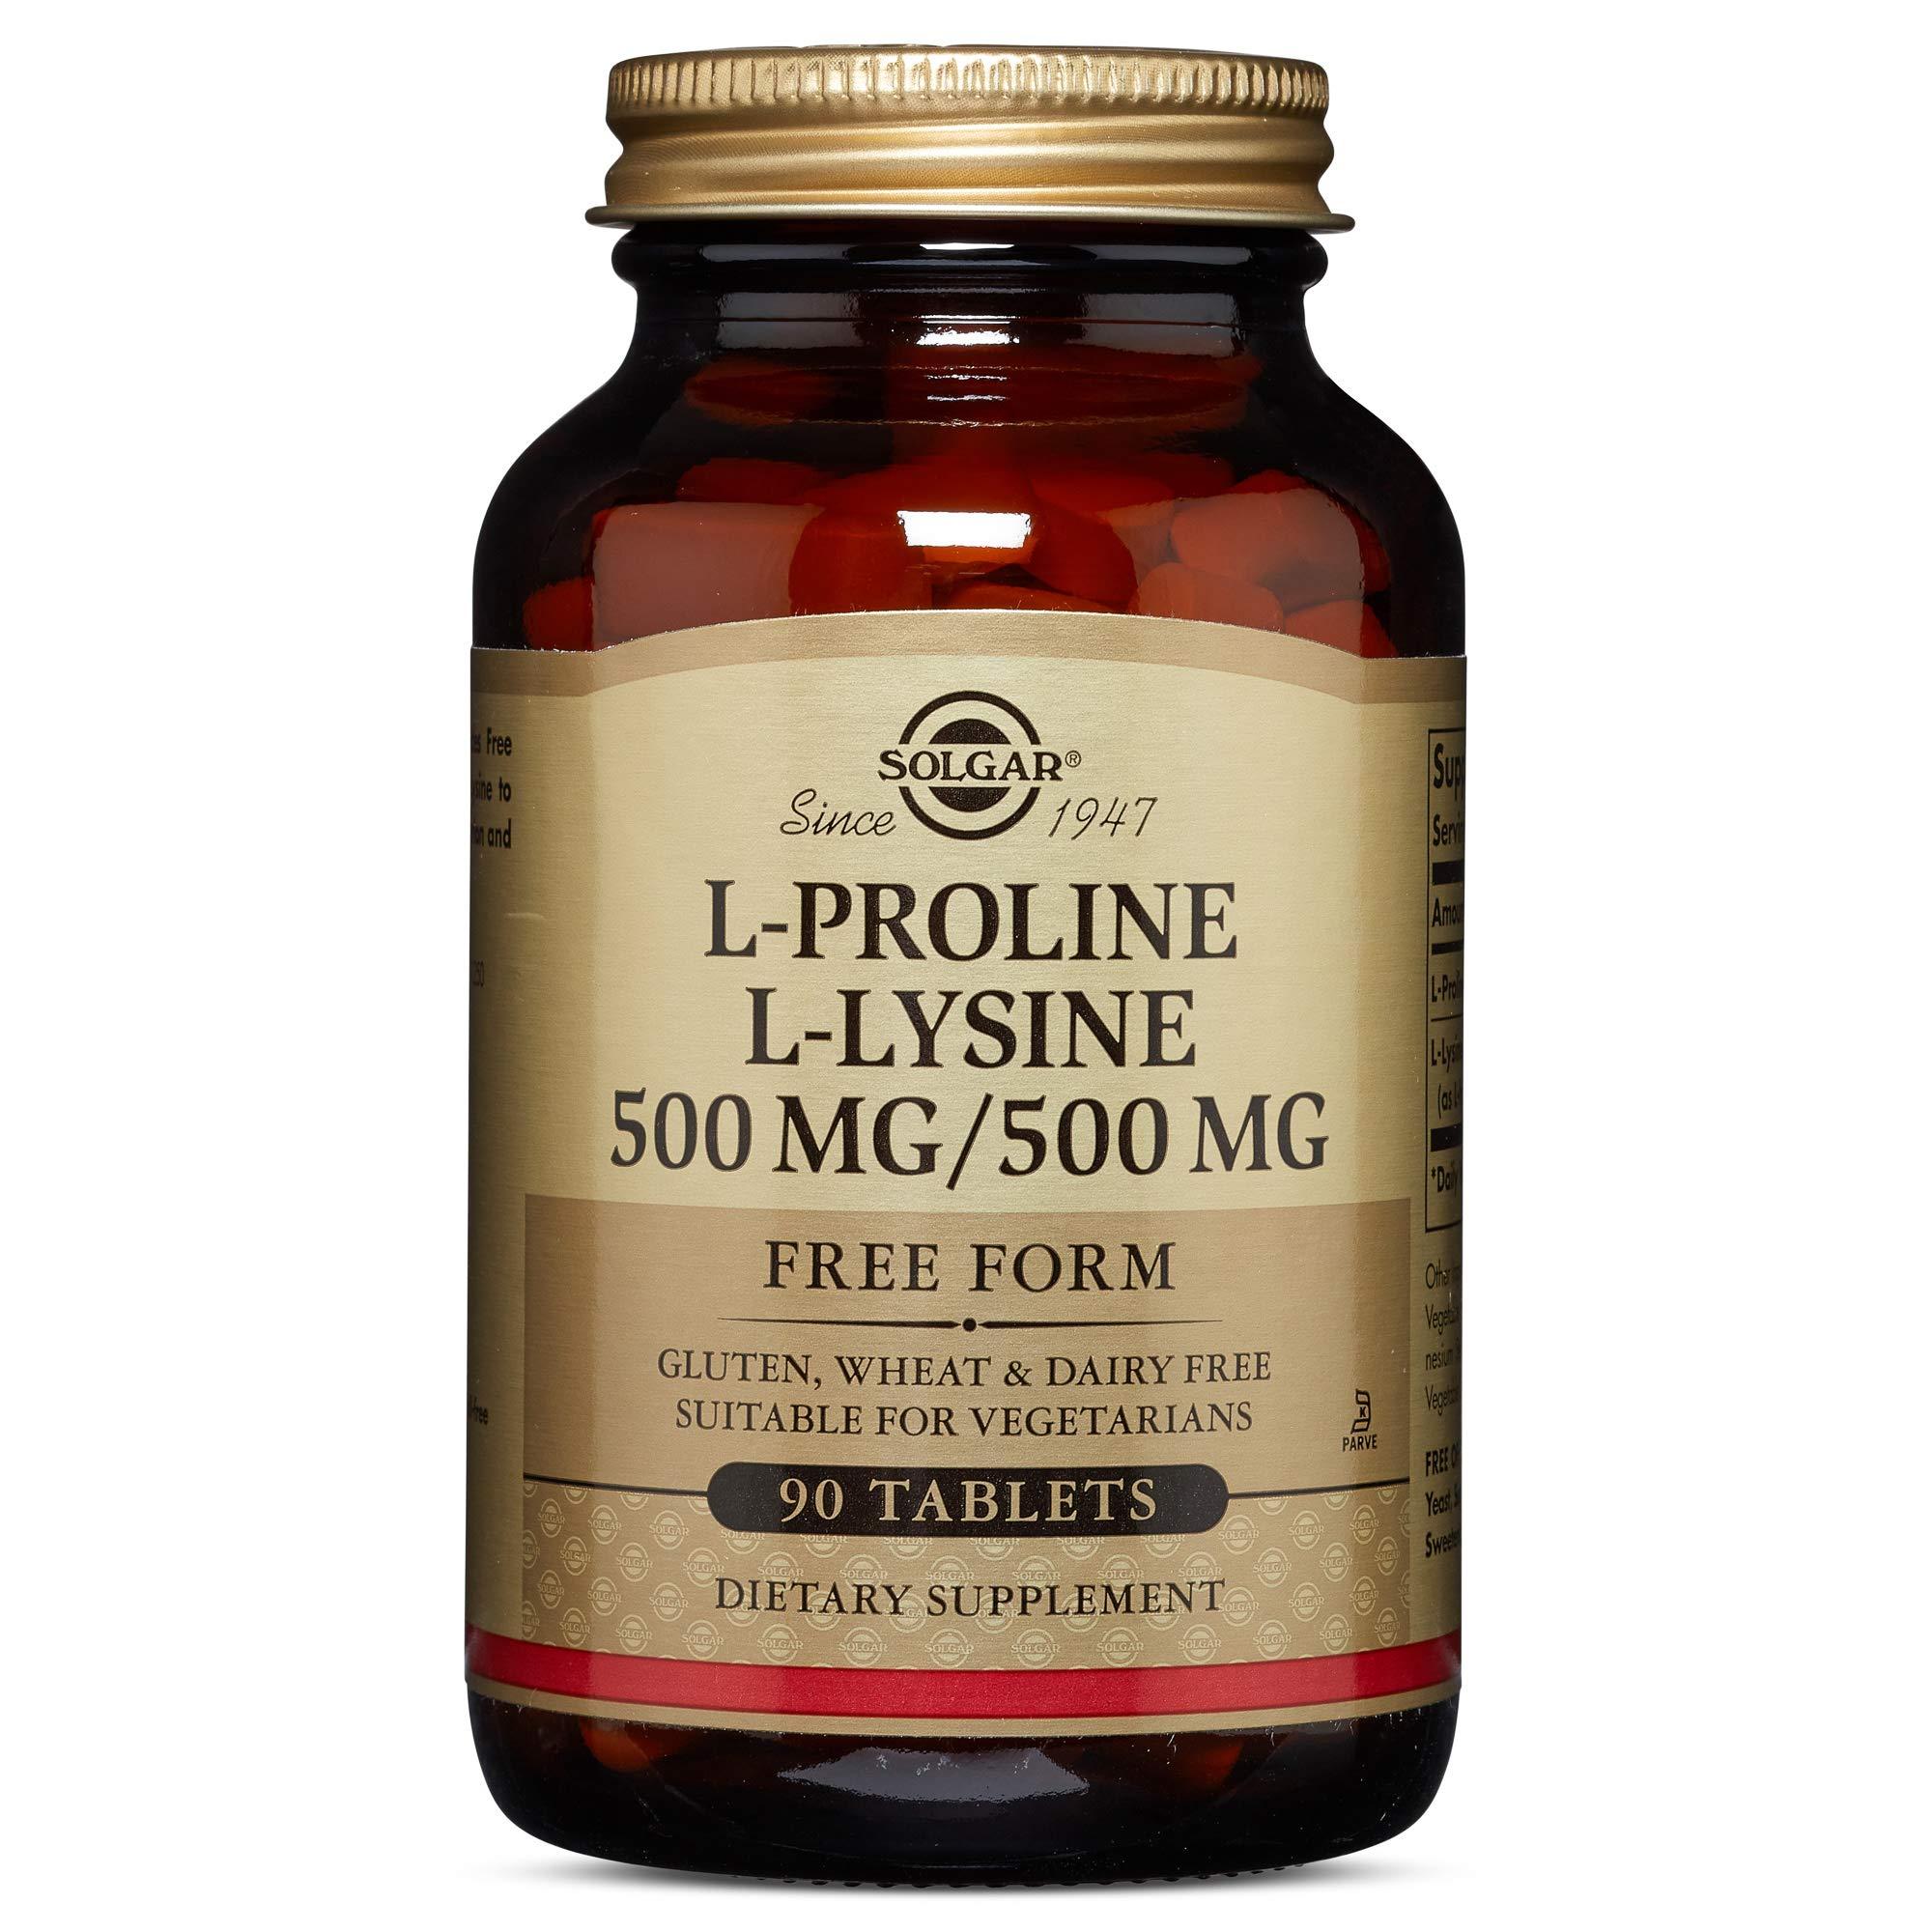 Solgar - L-Proline/L-Lysine (500/500 mg) 90 Tablets by Solgar